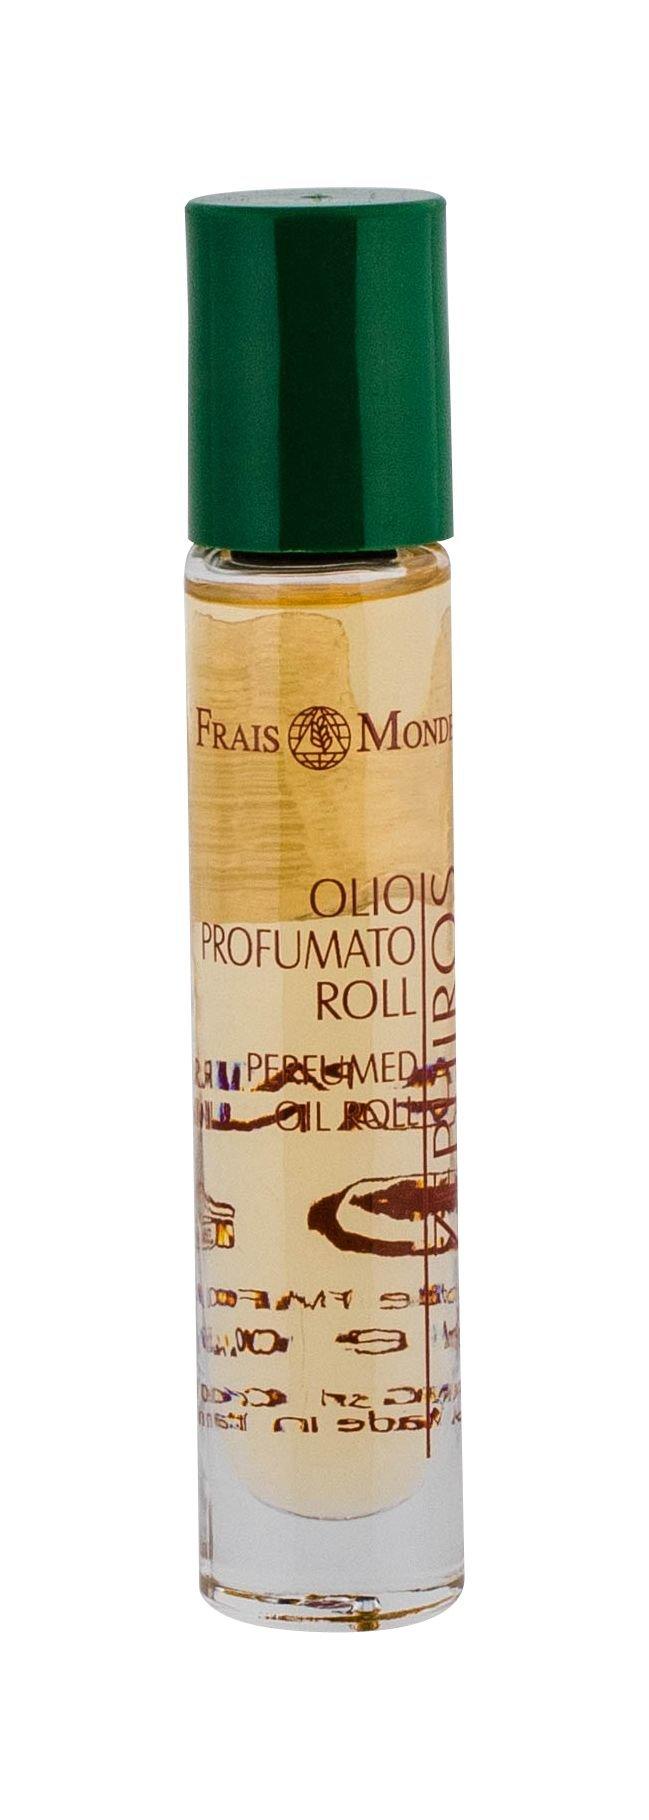 Frais Monde Zephiros Perfumed Oil Roll Perfumed oil 15ml